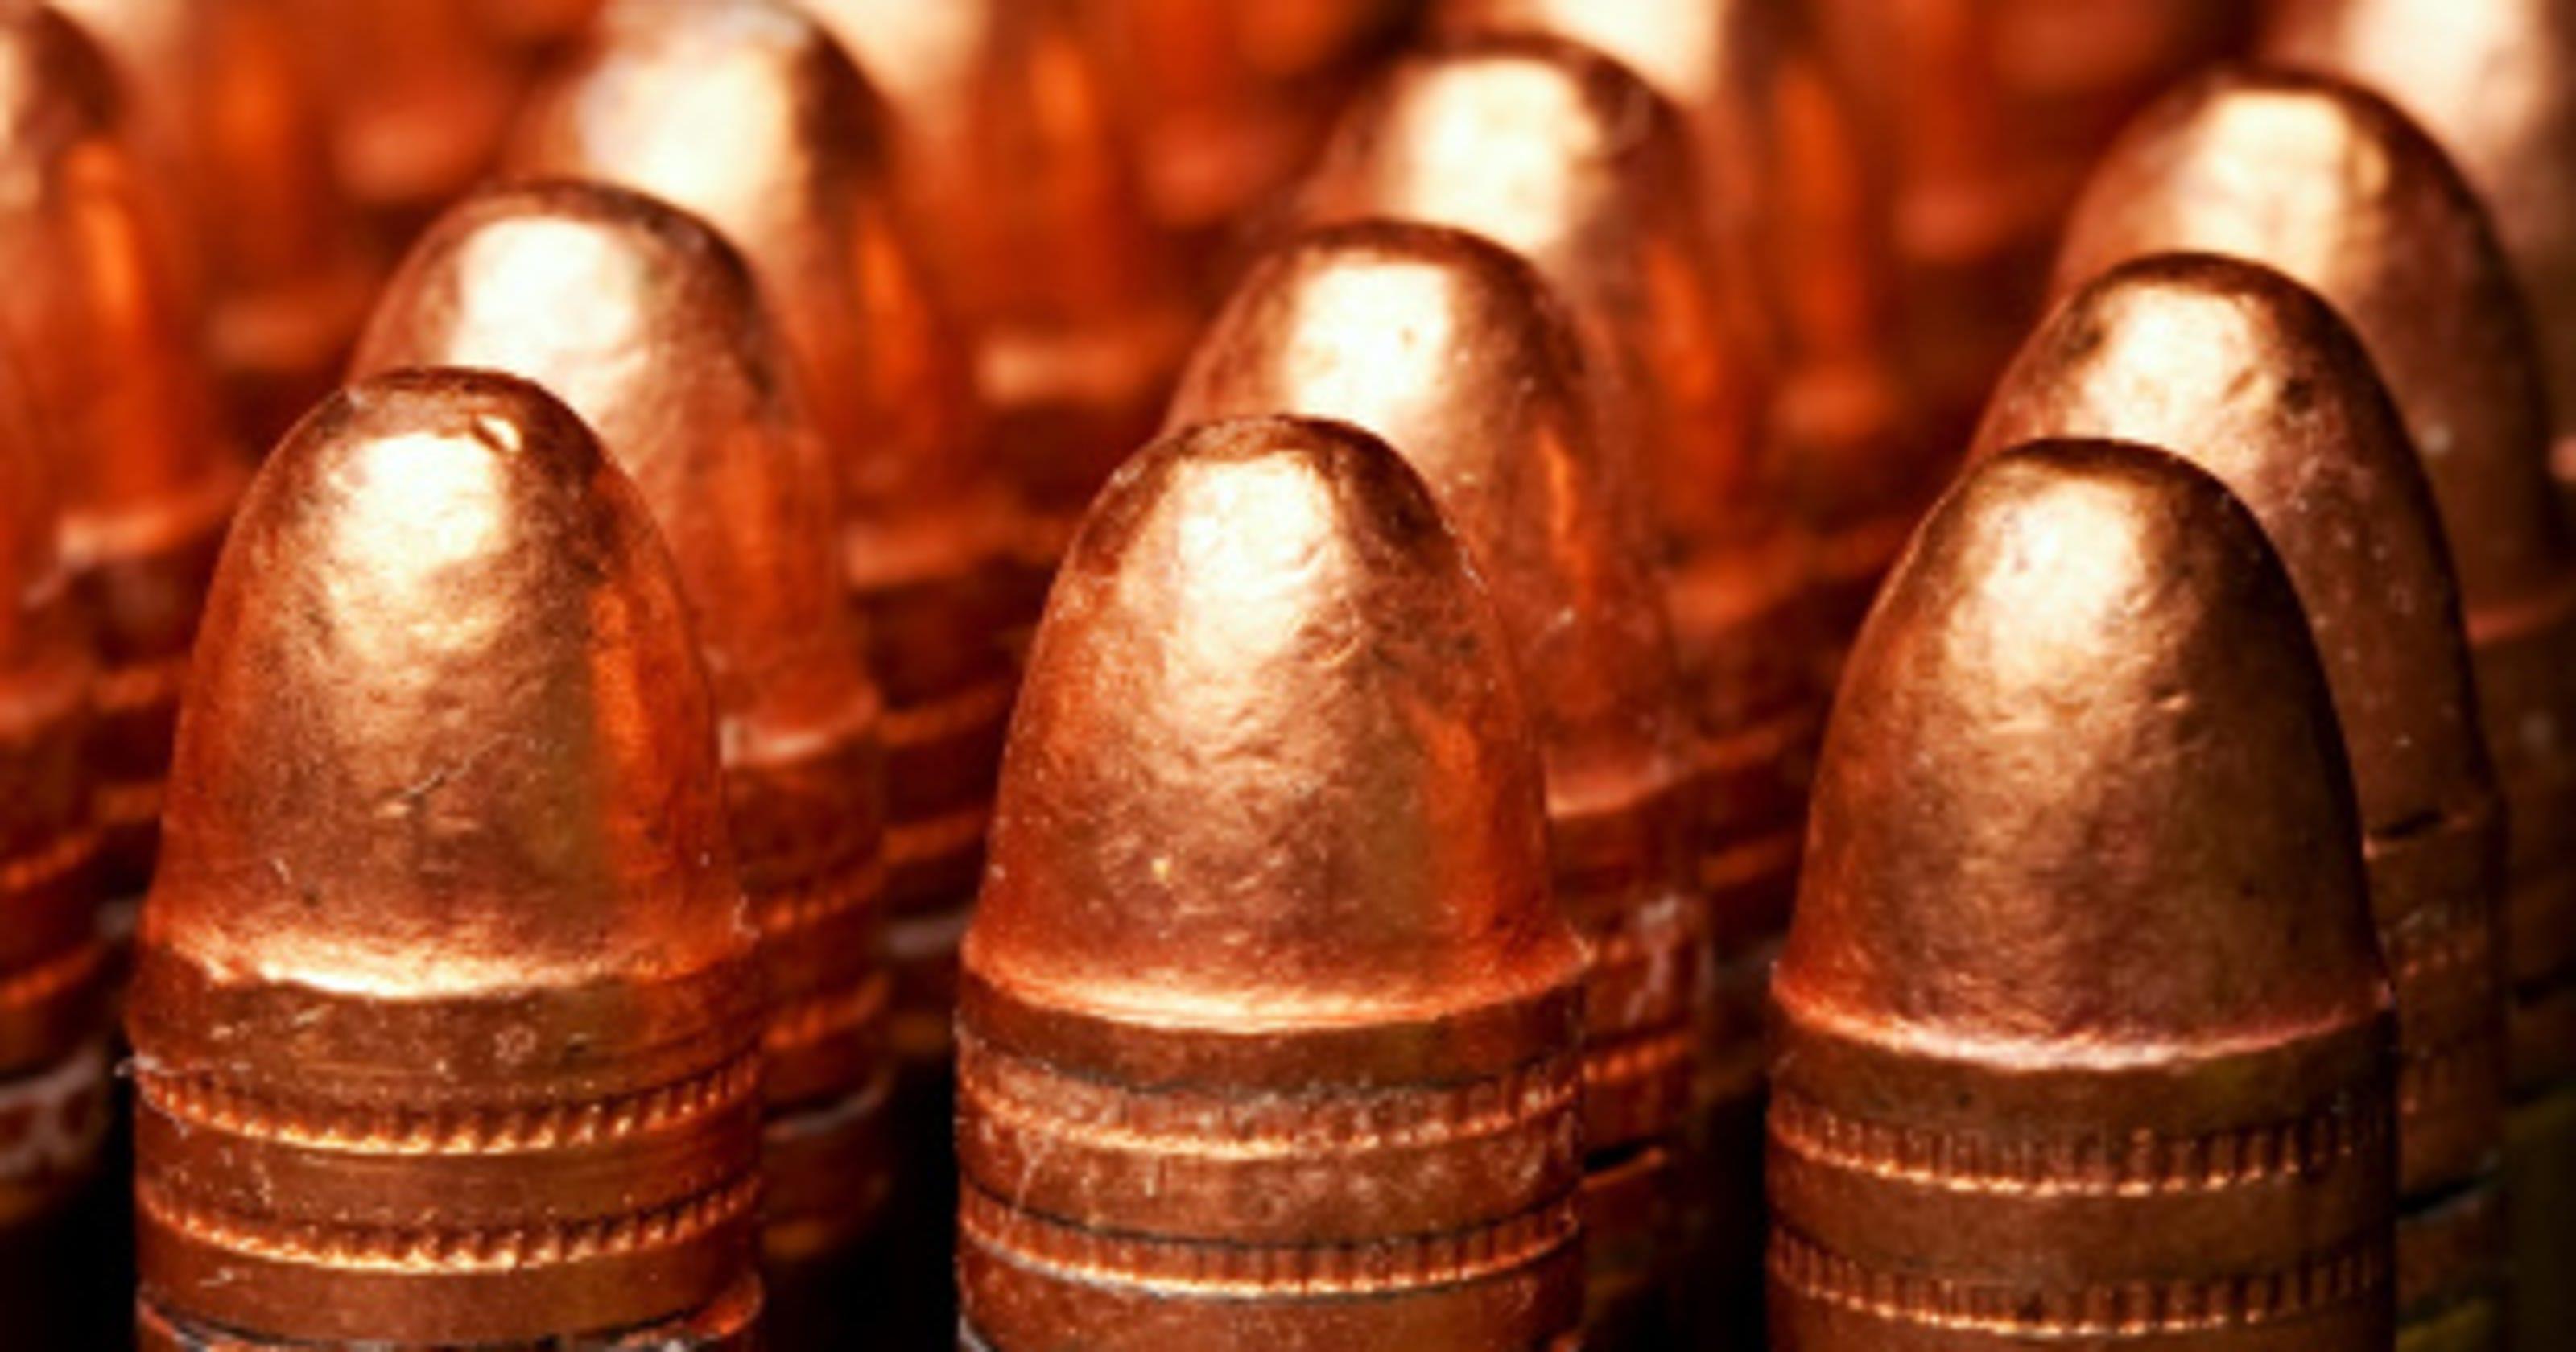 Walmart ammo decision won't diminish gun violence, but